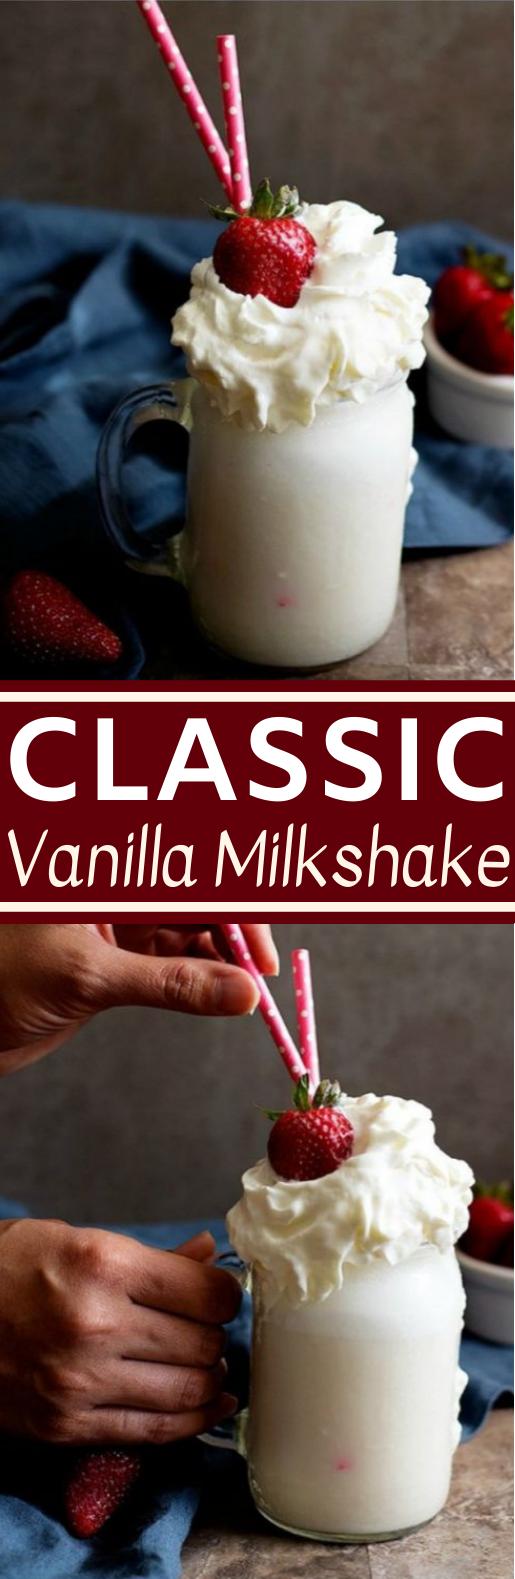 Classic Vanilla Milkshake #drink #recipes #snacks #kidfriendly #milk